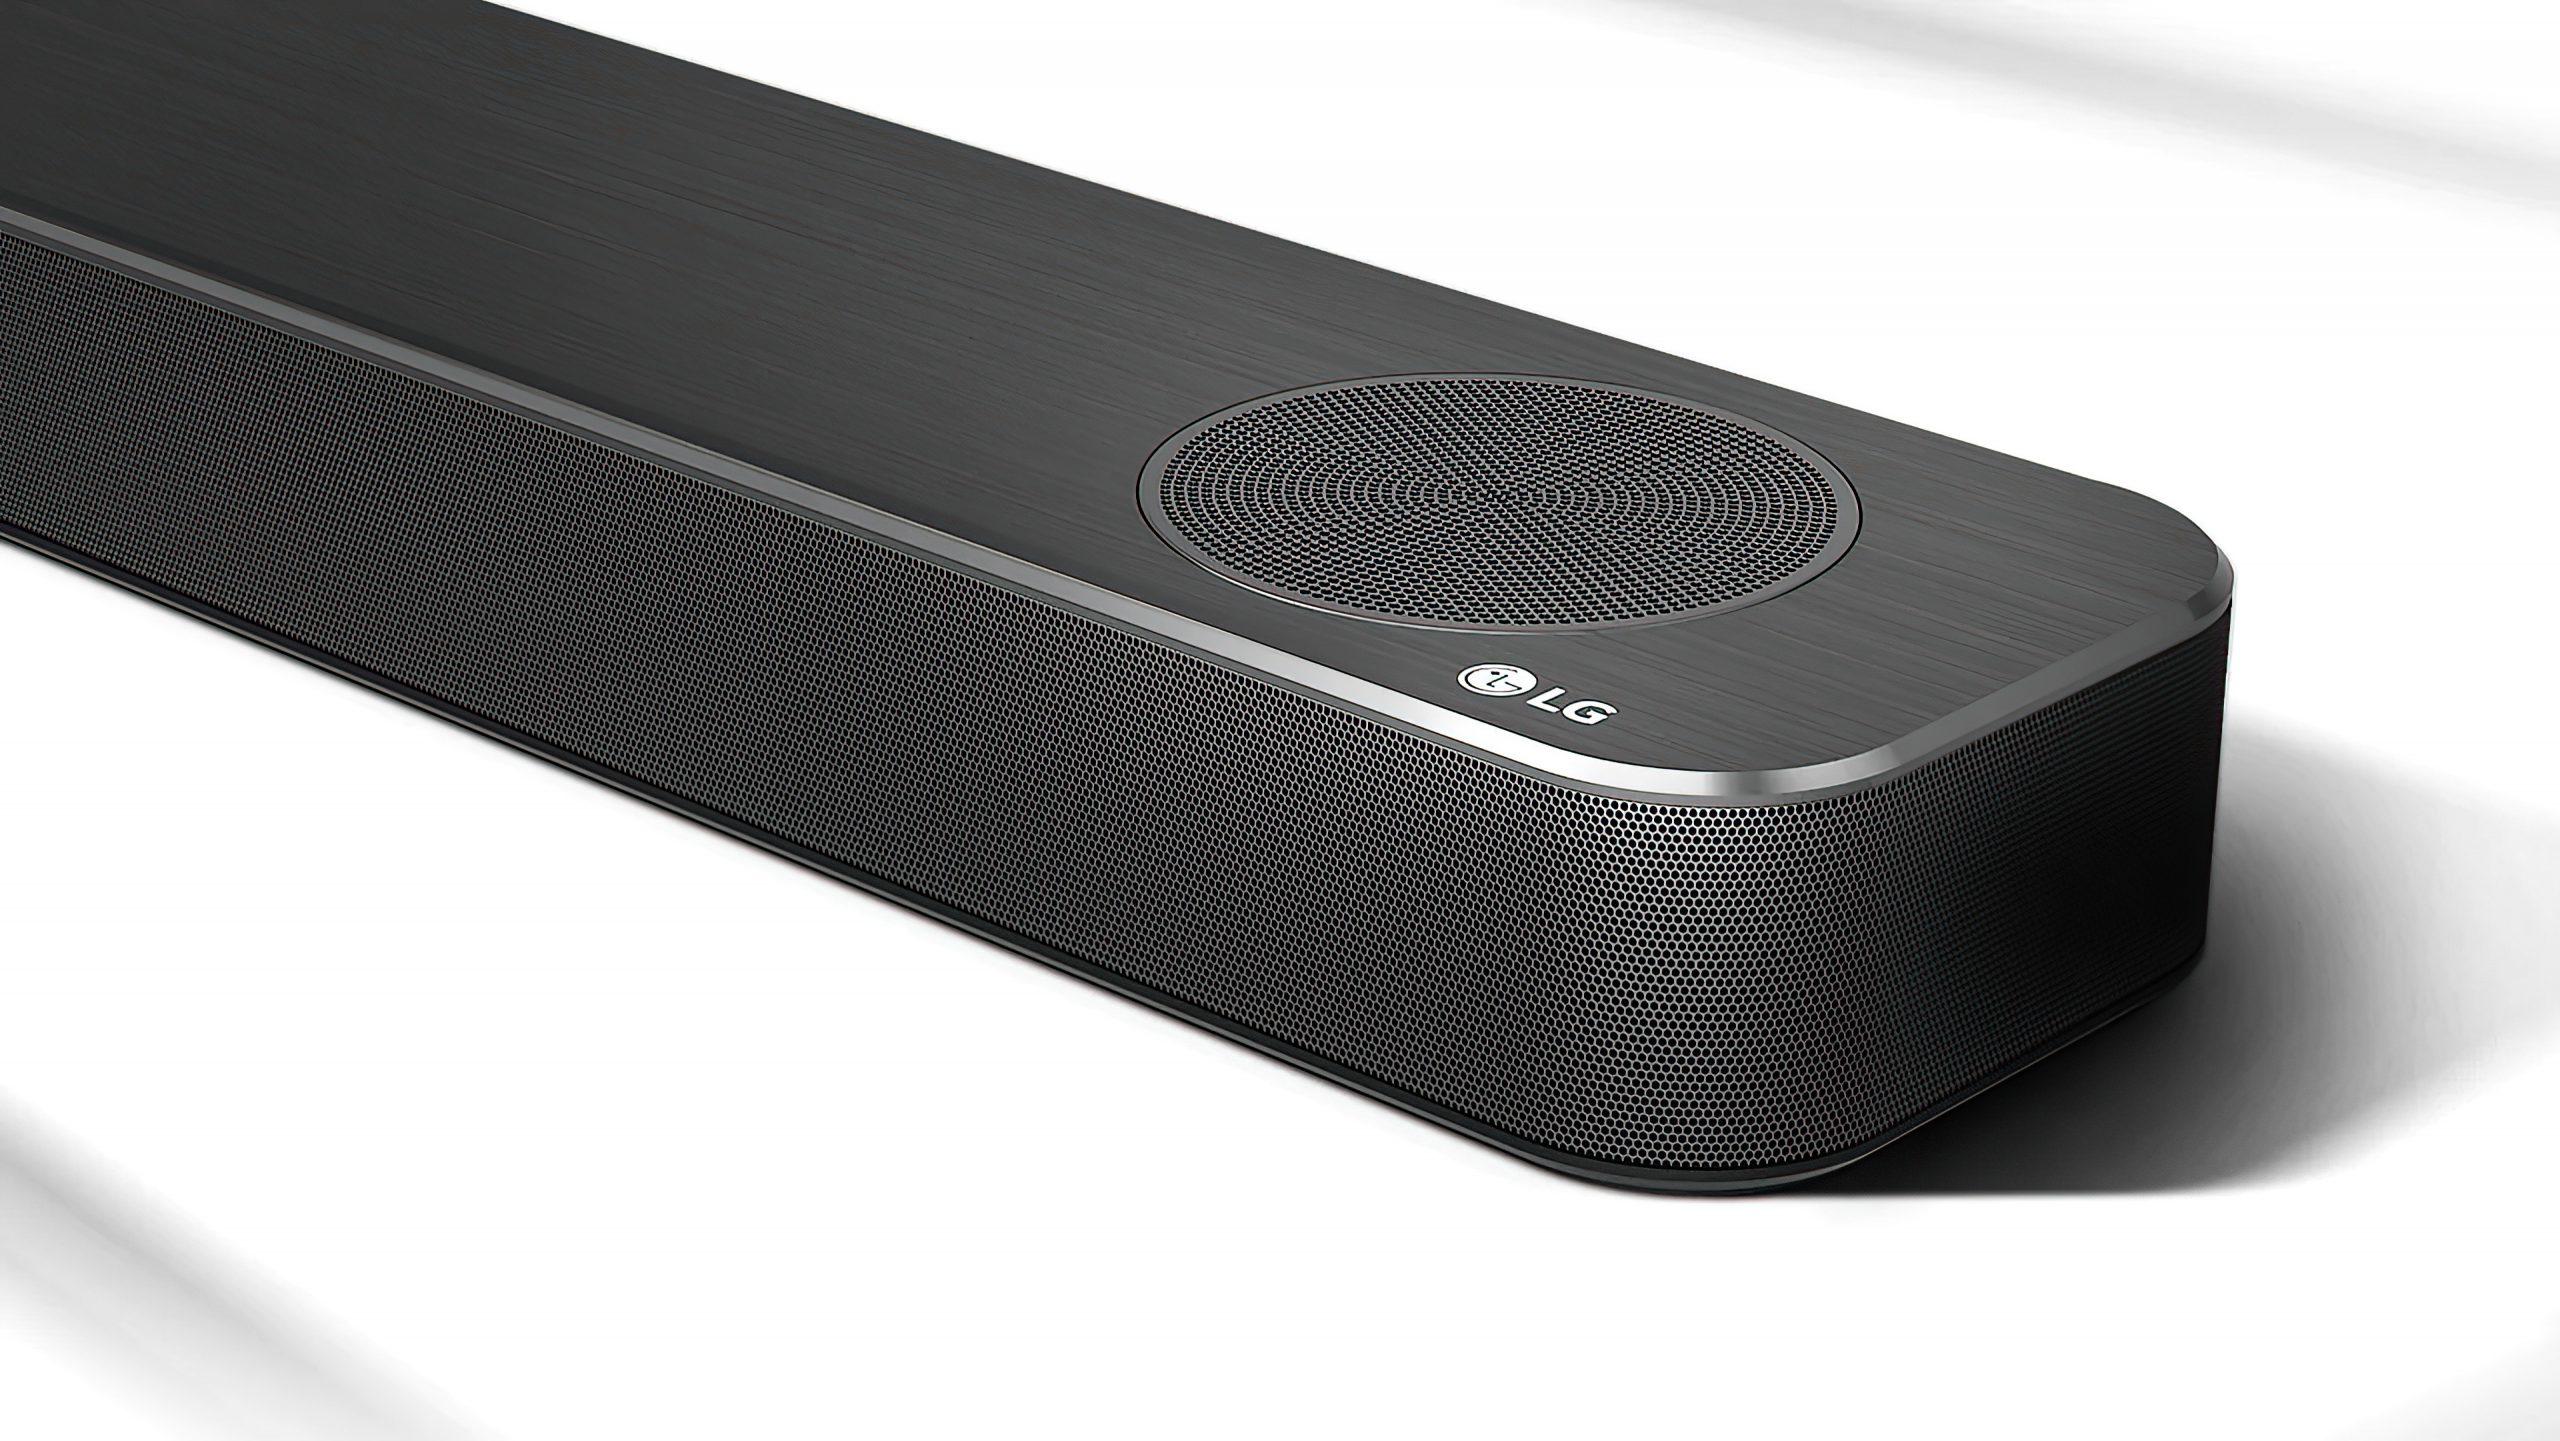 LG sn8yg top speaker